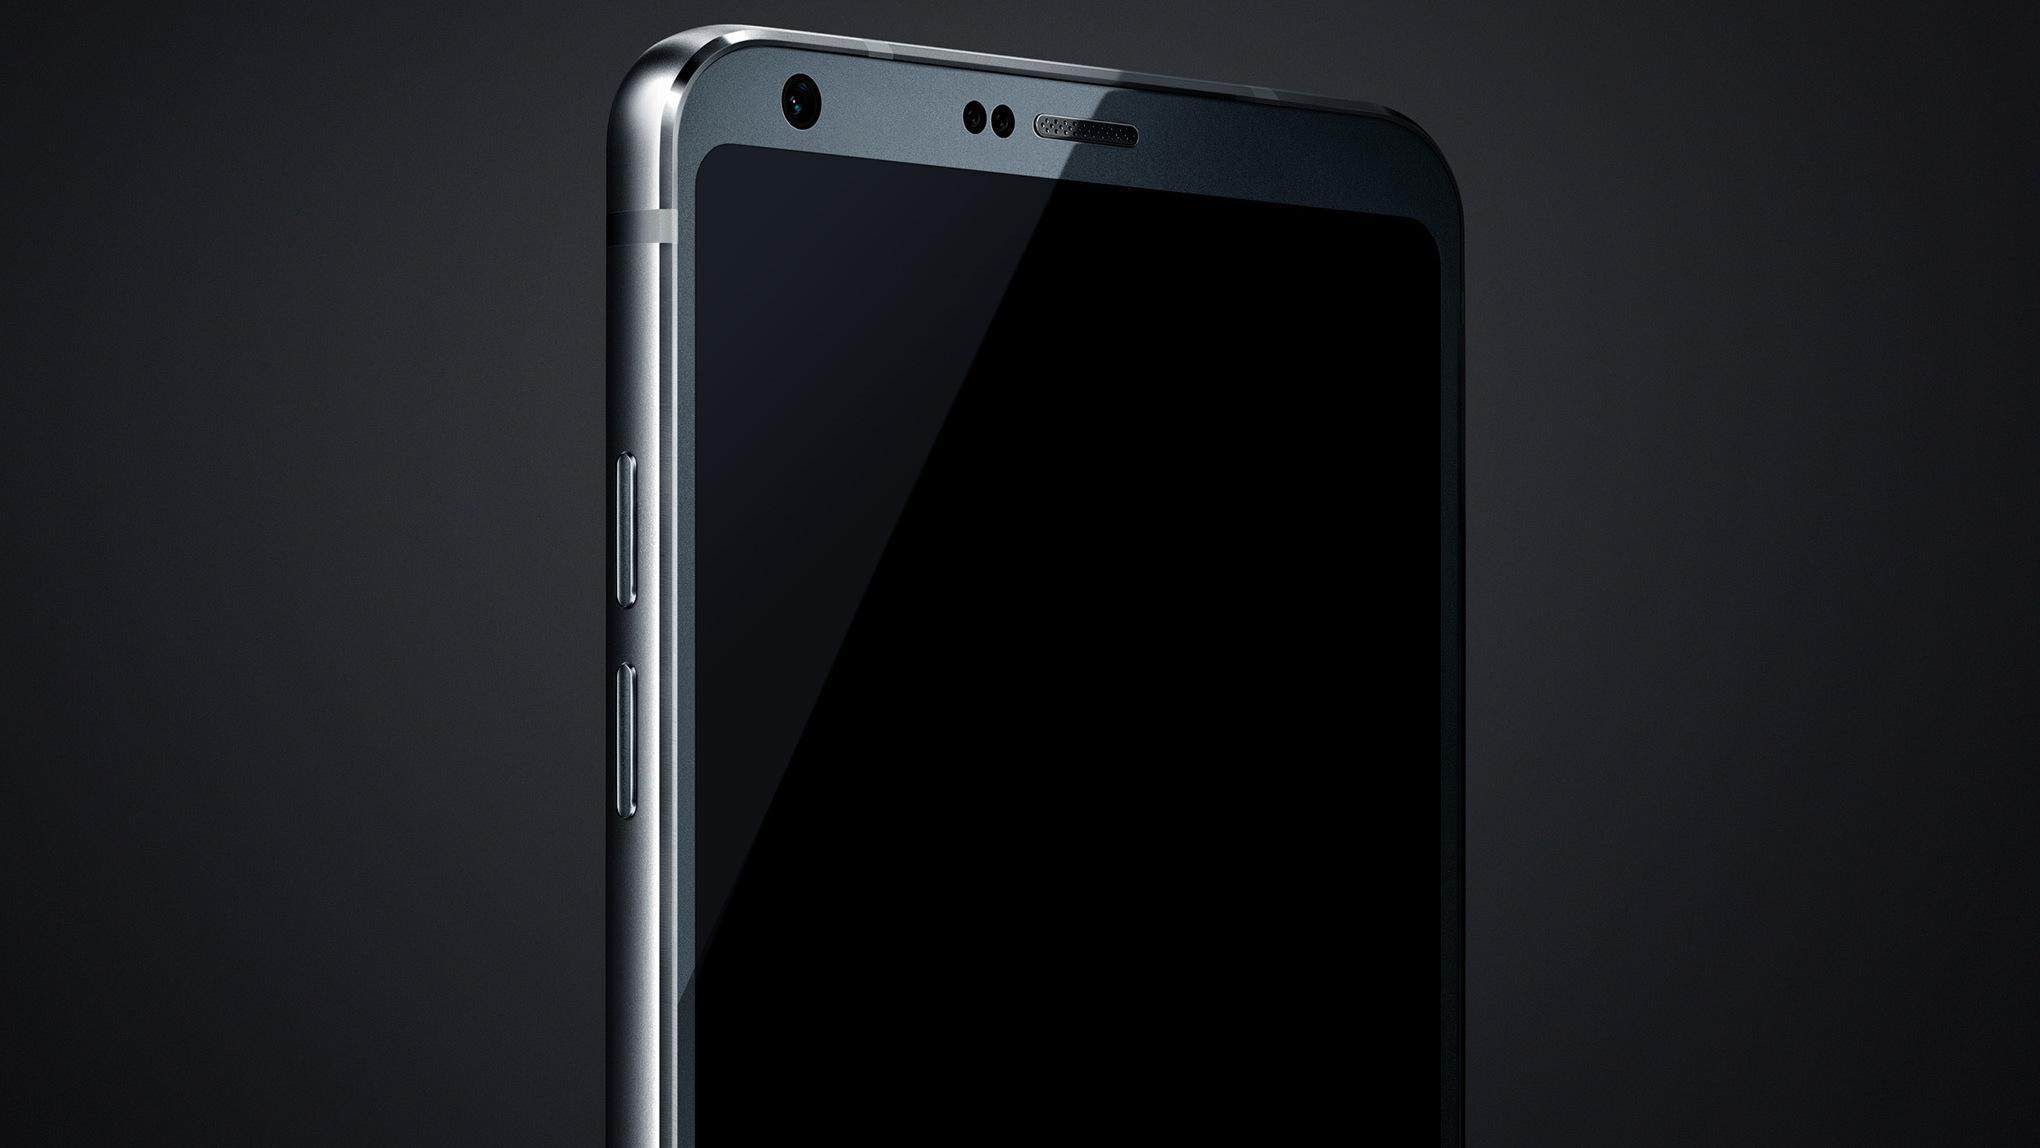 LG G6 får vidvinkelkamera både foran og bak